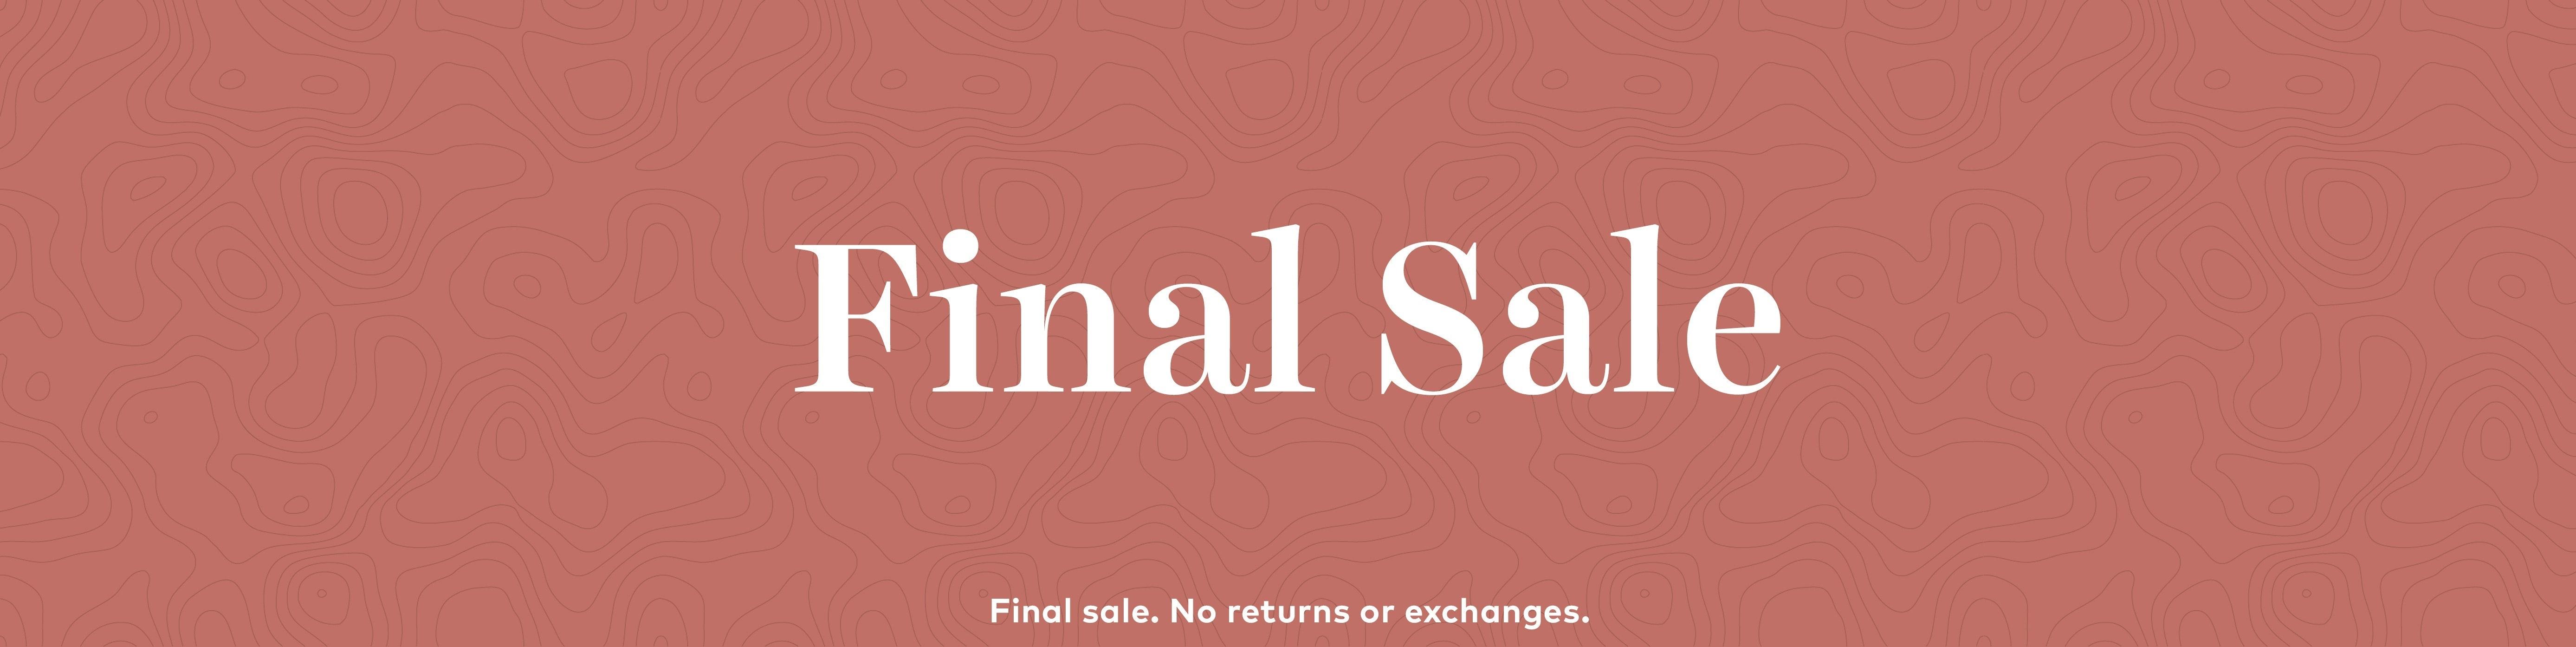 Final Sale Hero Image